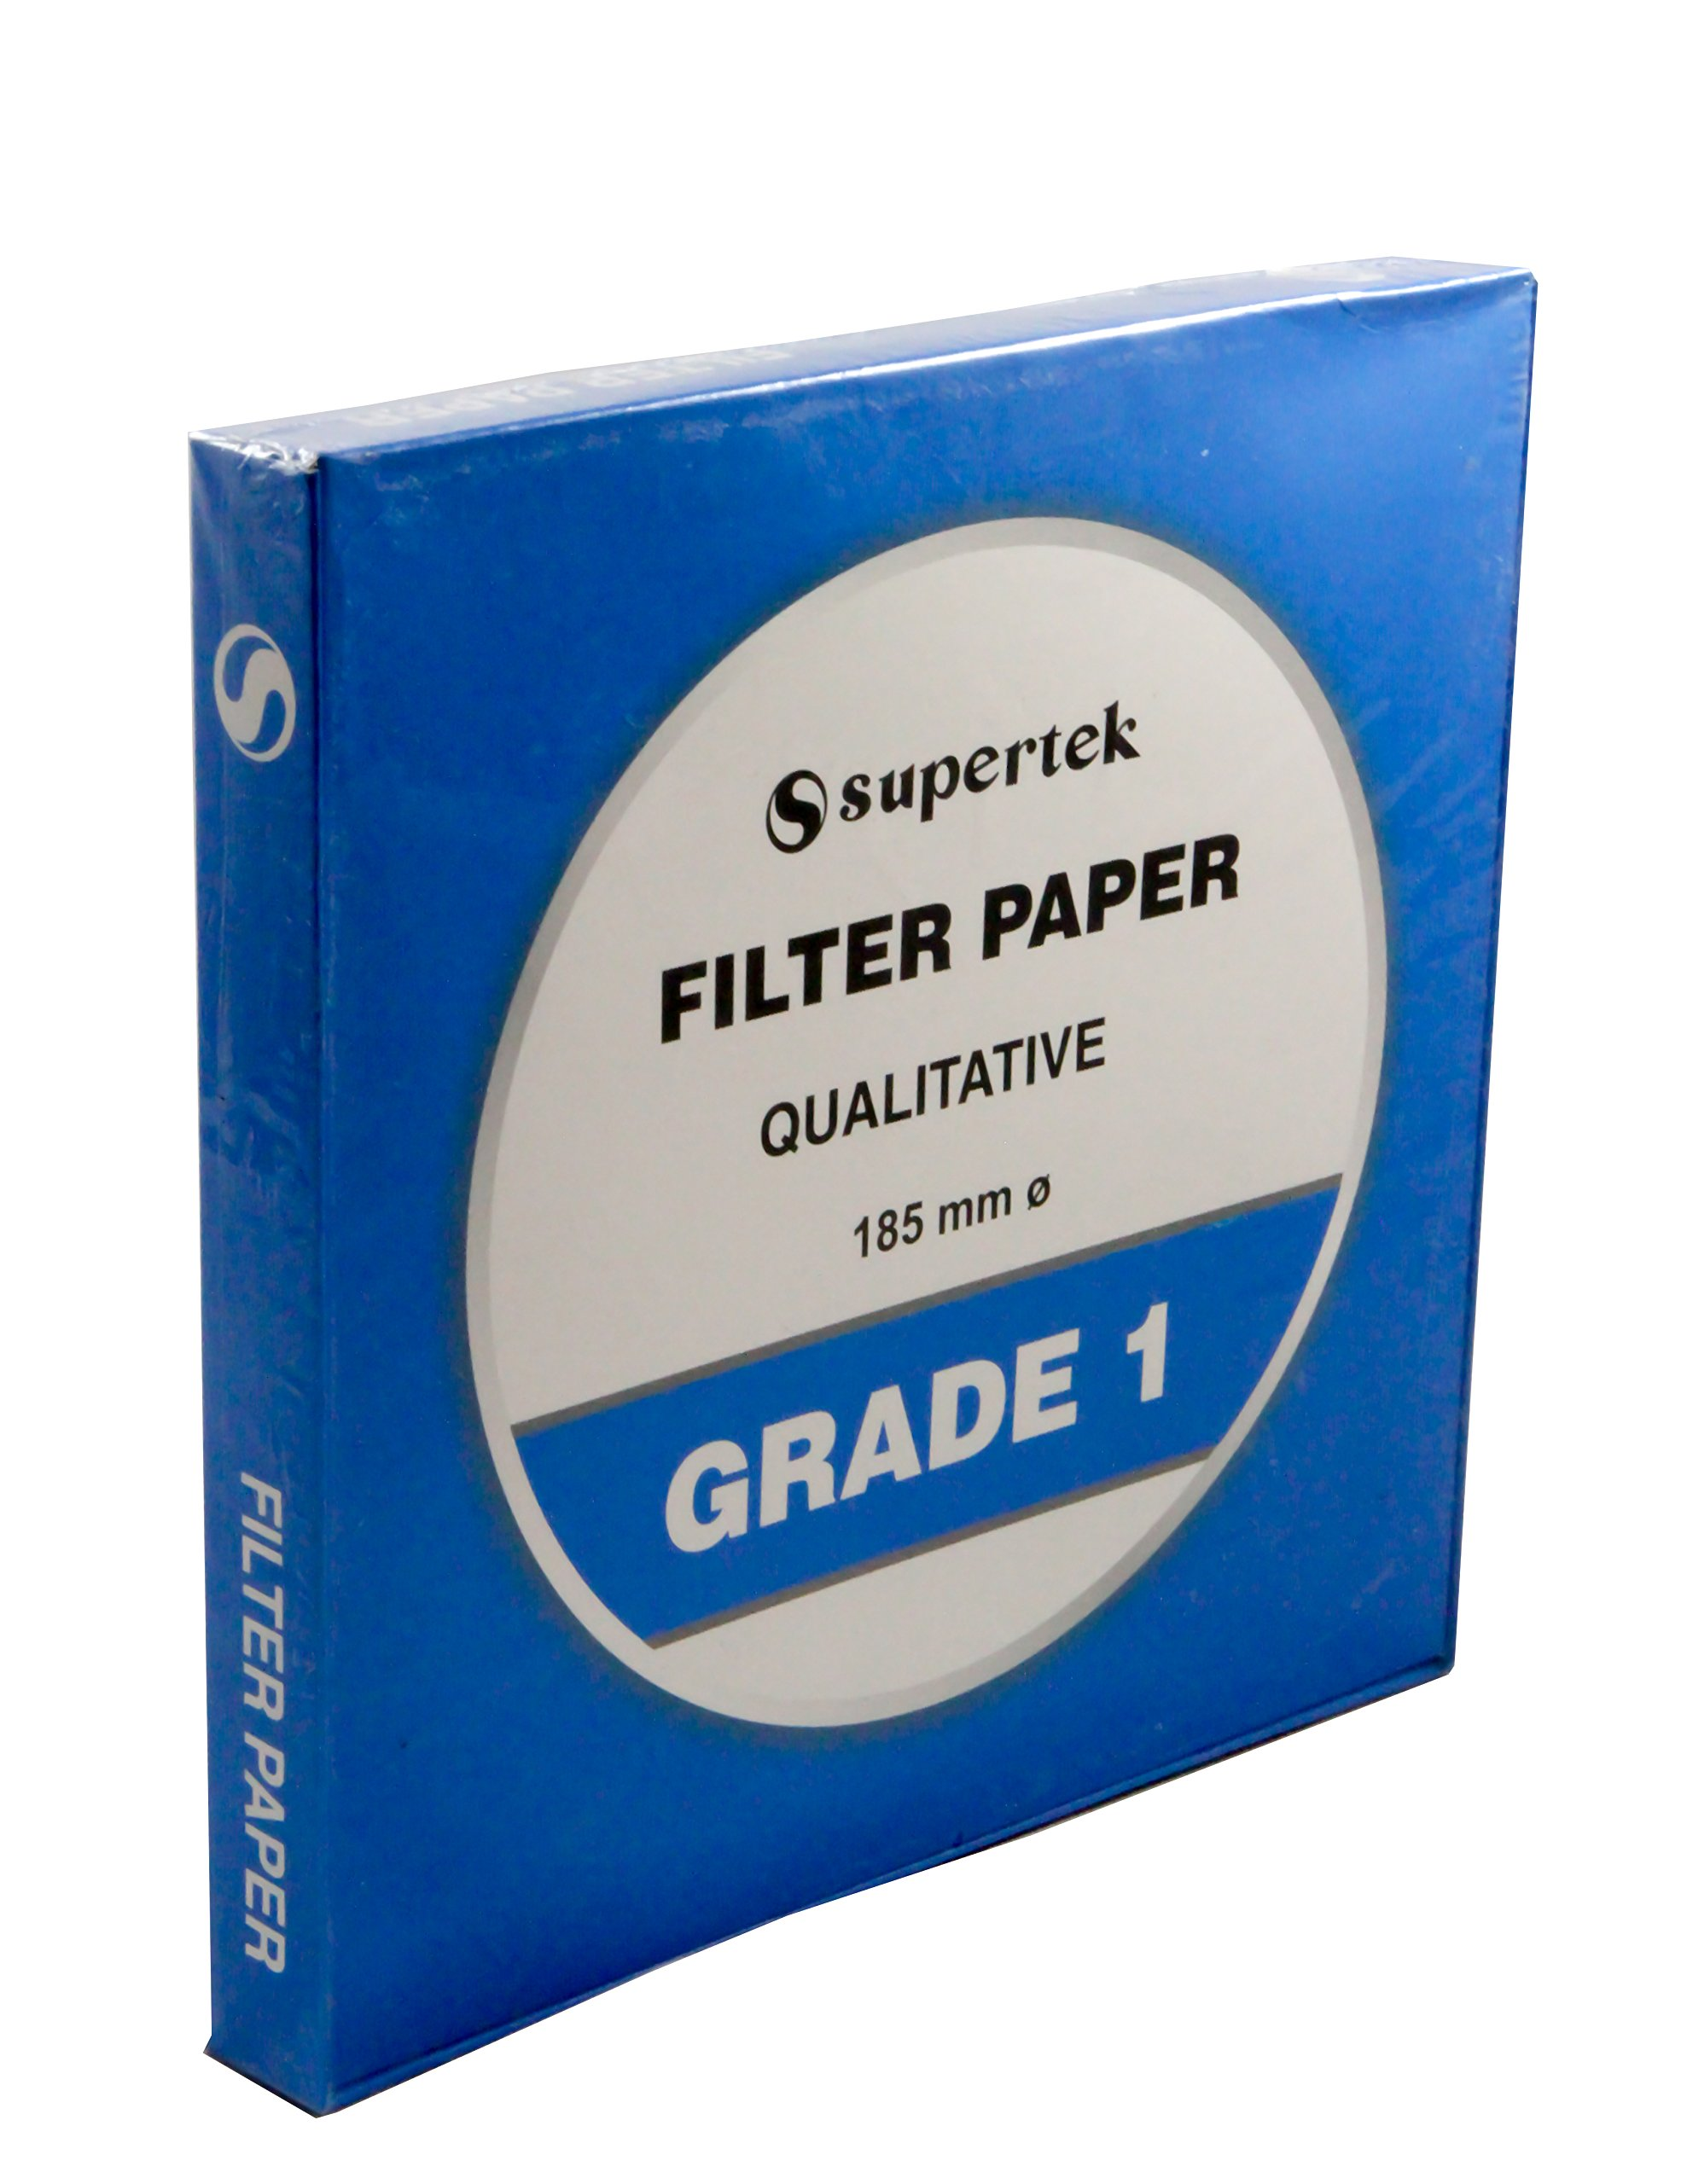 SEOH Filter Paper Qualitative Slow 24cm